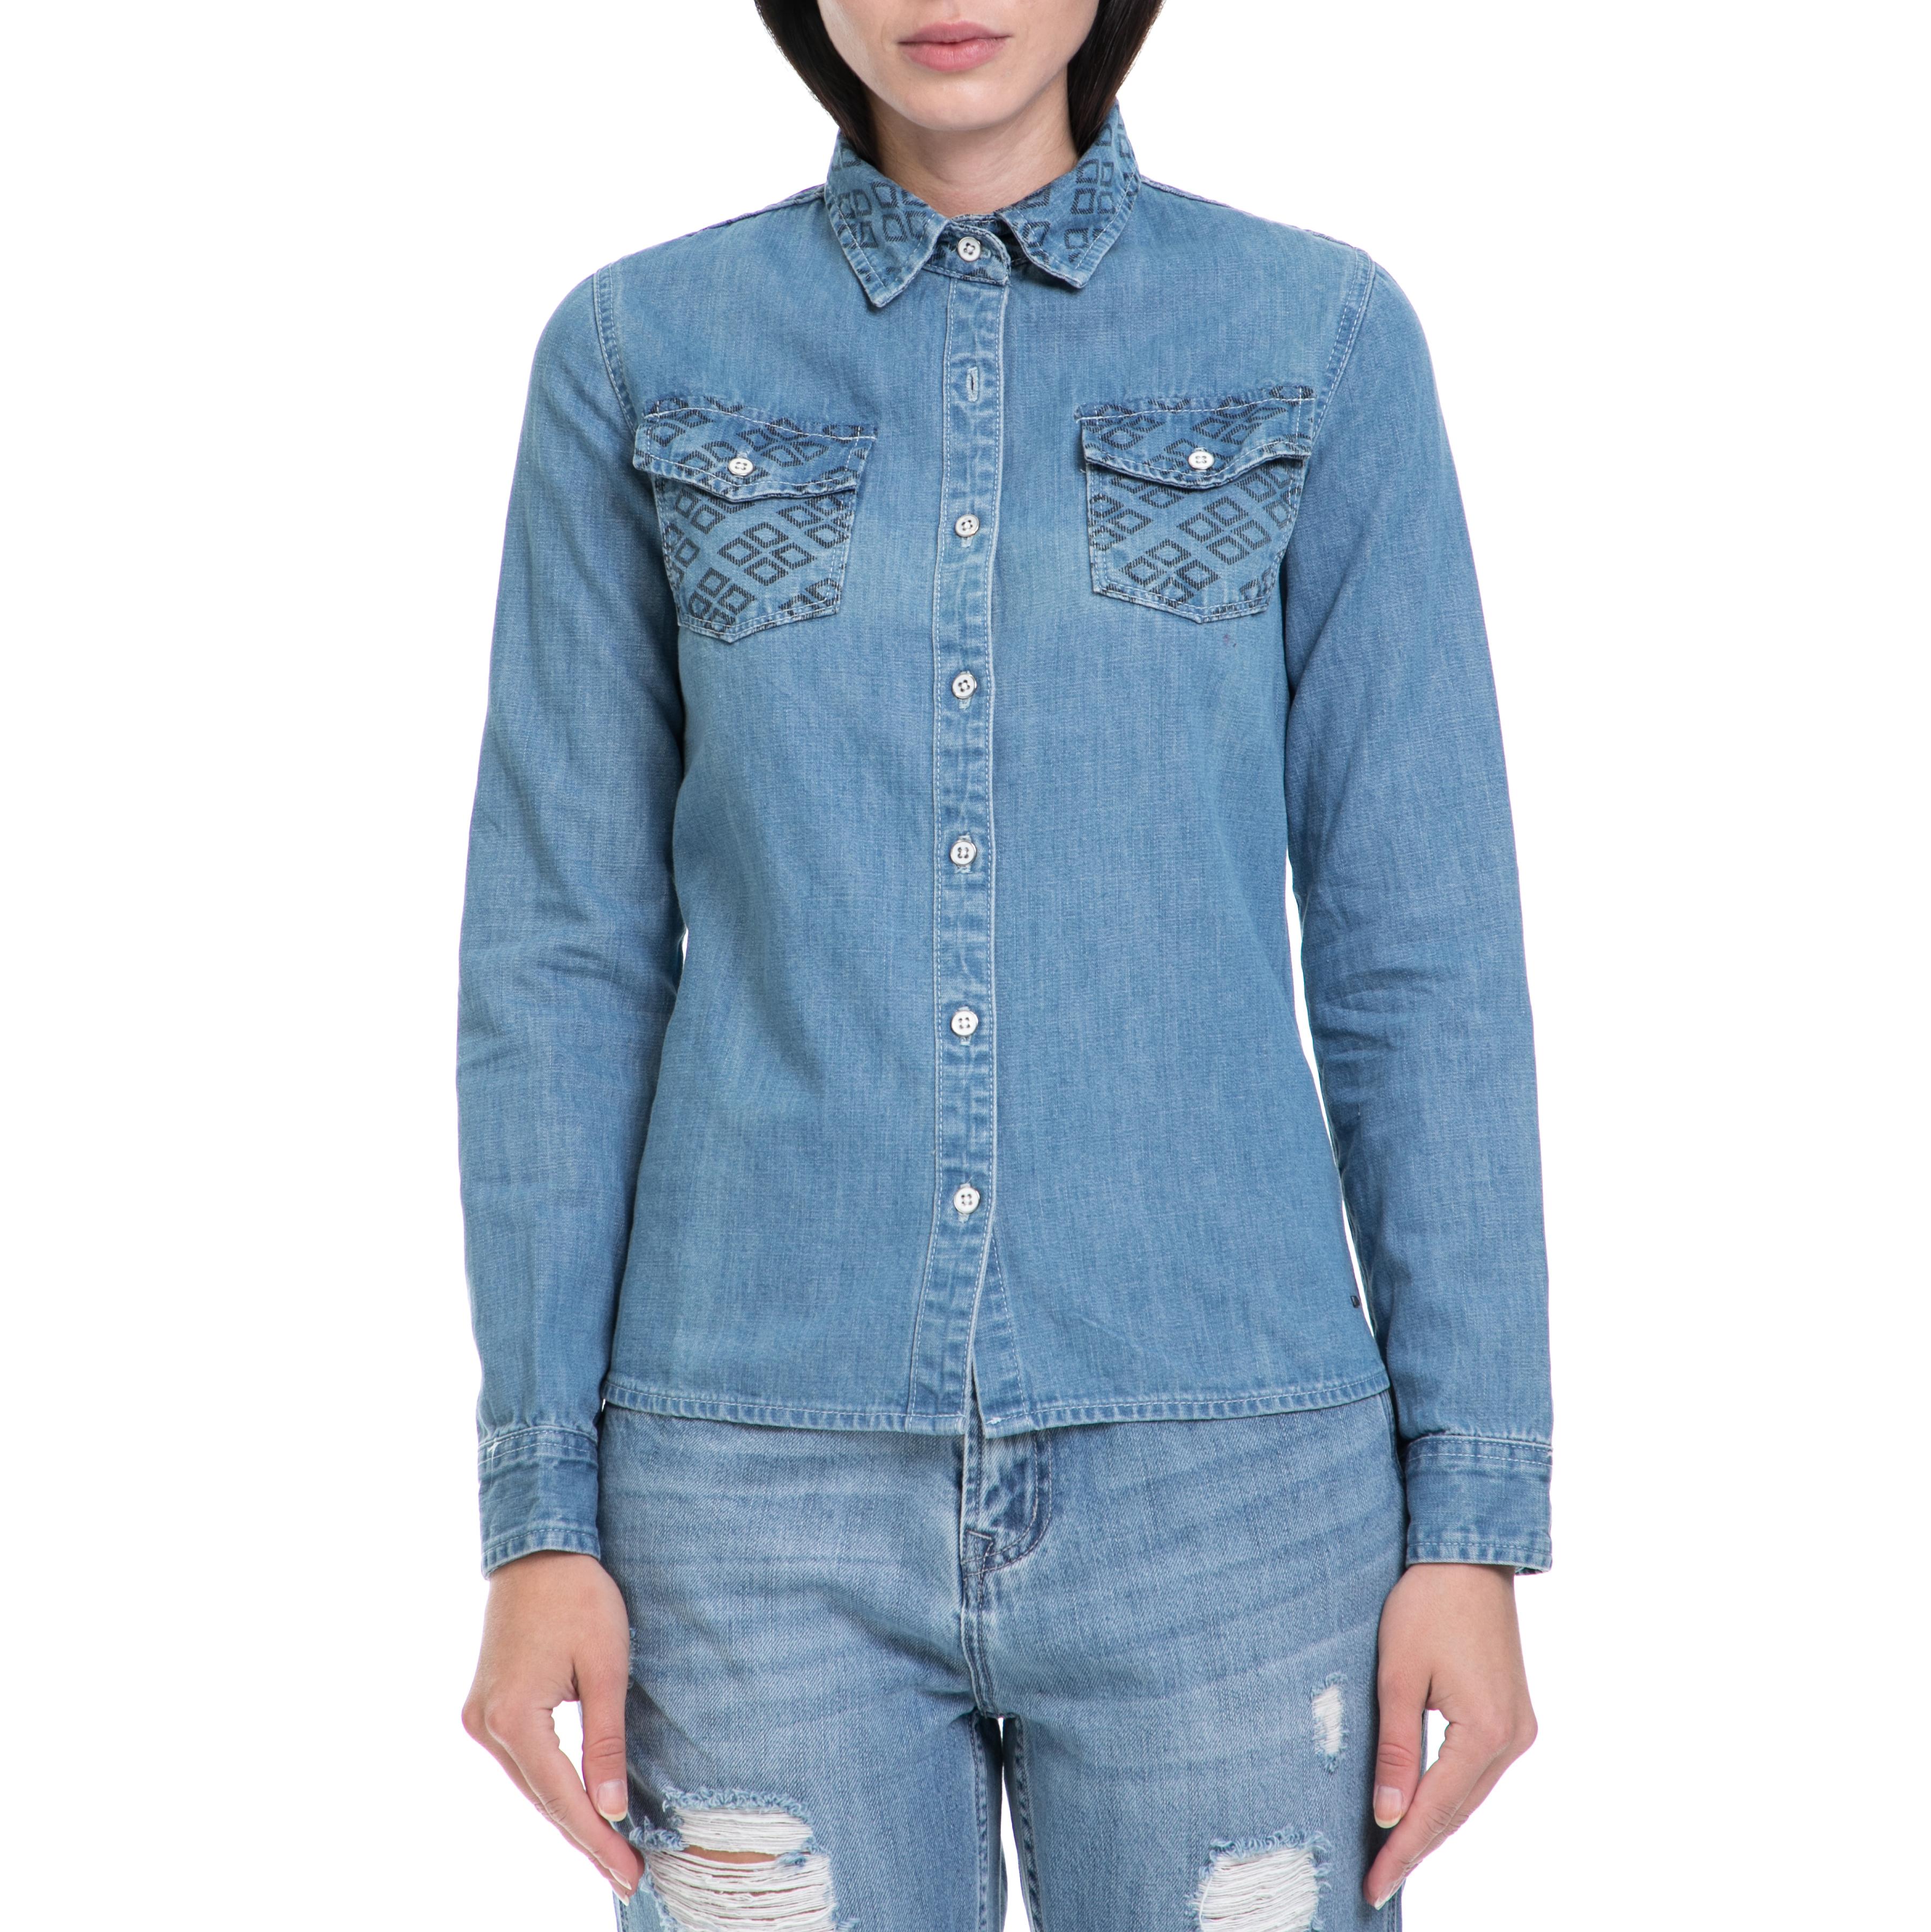 36a7004352c1 FUNKY BUDDHA - Γυναικείο πουκάμισο FUNKY BUDDHA μπλε